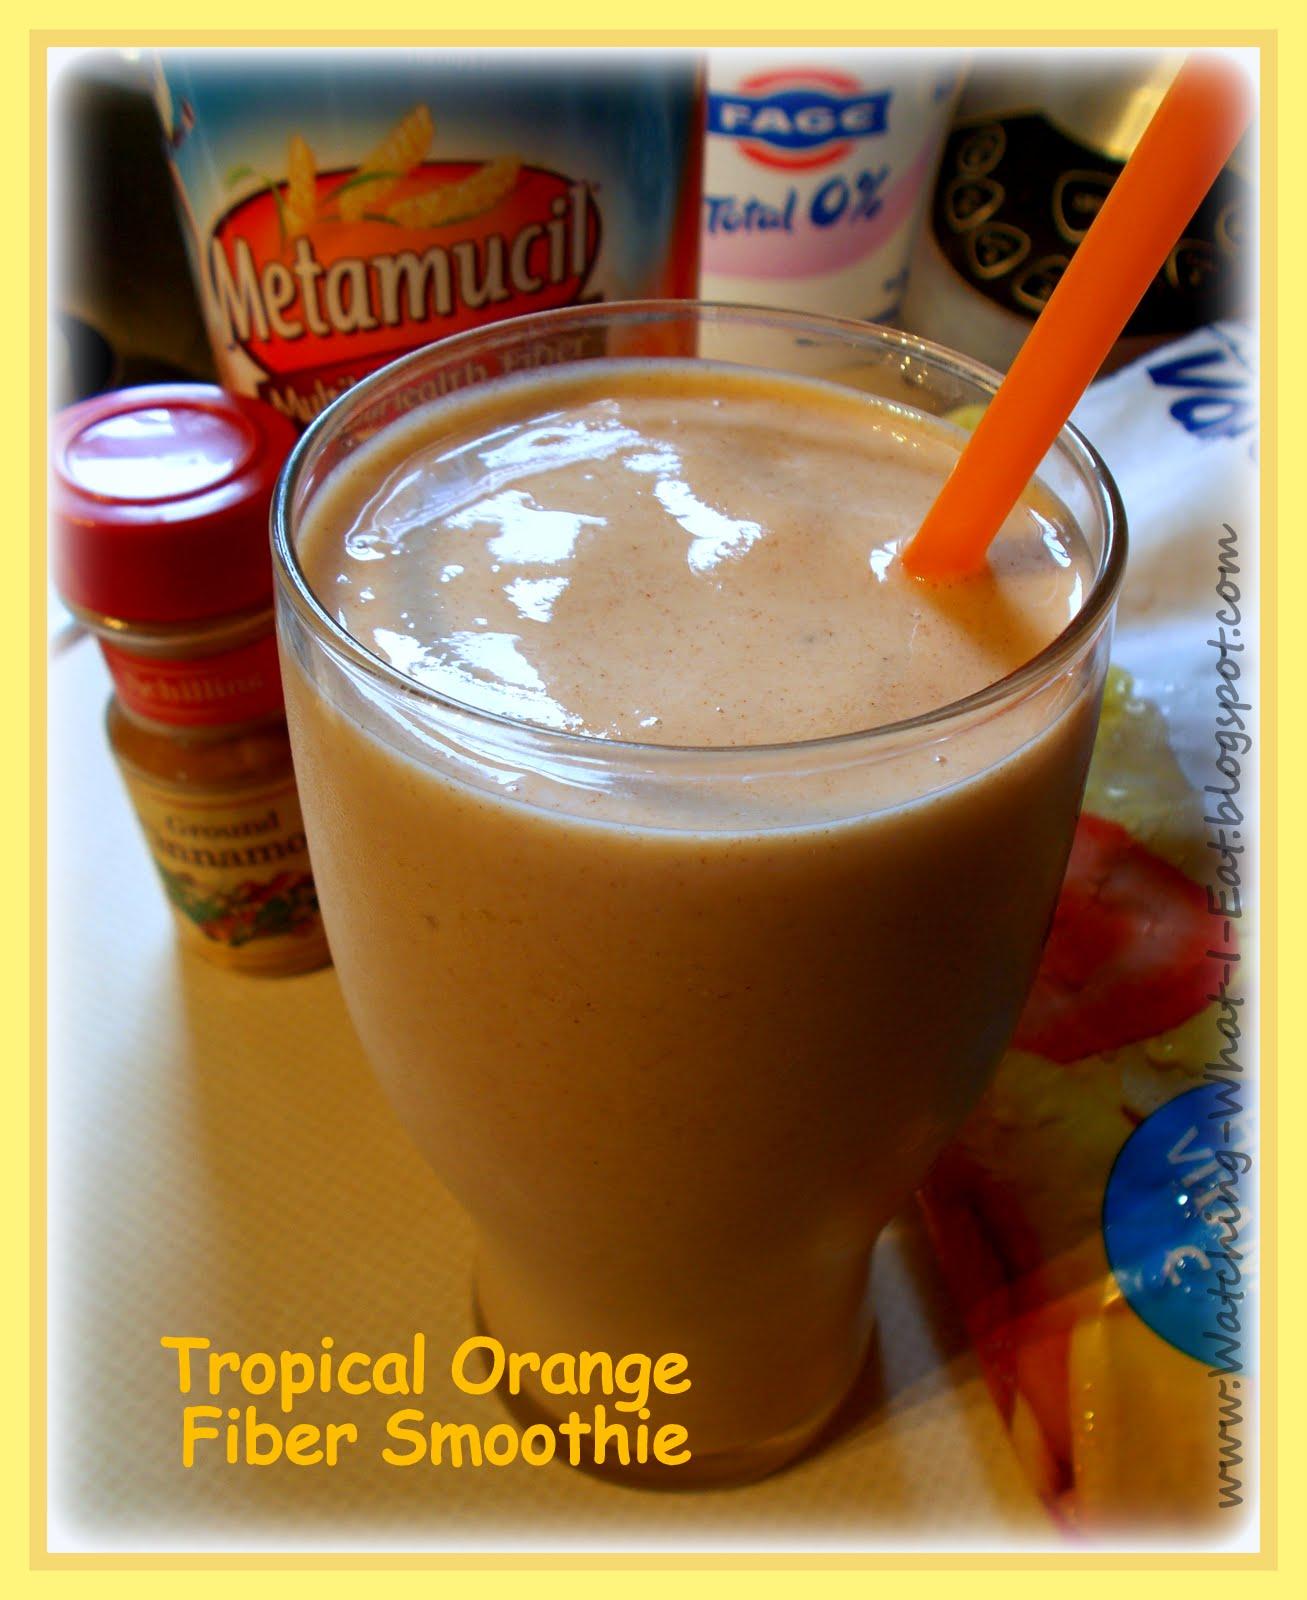 Watching What I Eat: Tropical Orange Fiber Smoothie